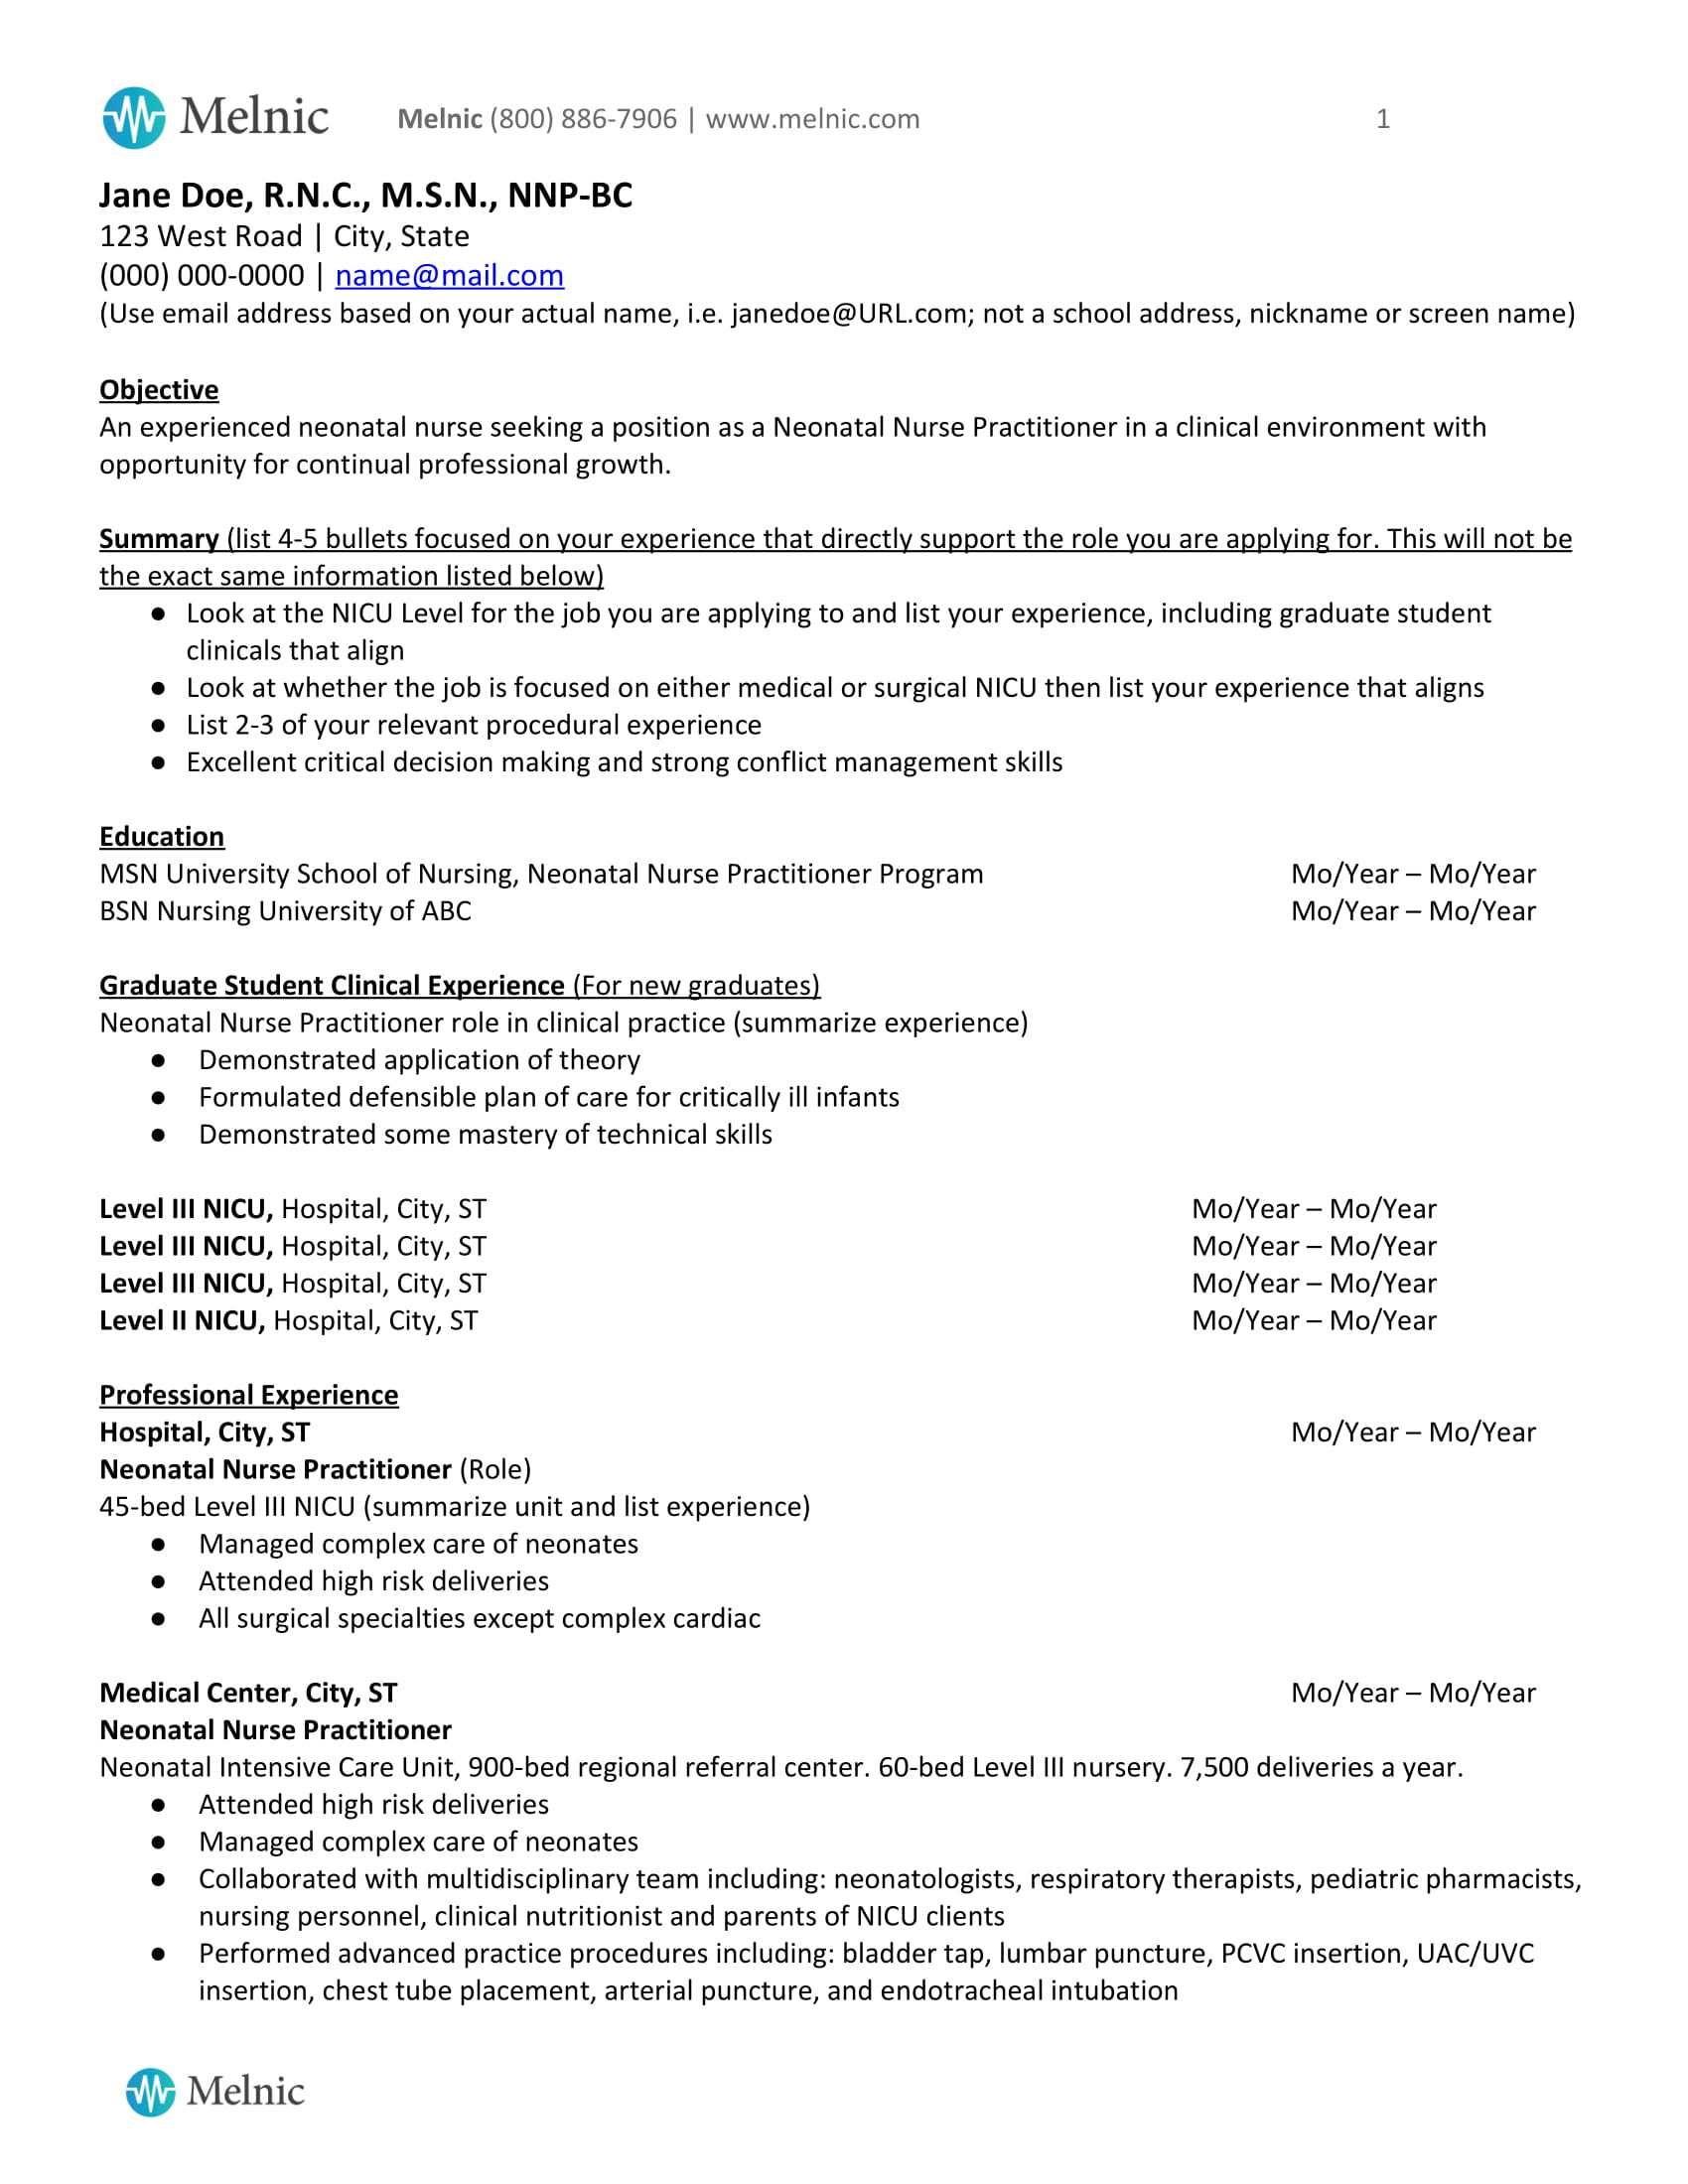 Neonatal Nurse Practitioner Sample Resume For Job Seekers Melnic Neonatal Neonatal Nurse Practitioner Nurse Practitioner Student New Grad Nursing Resume